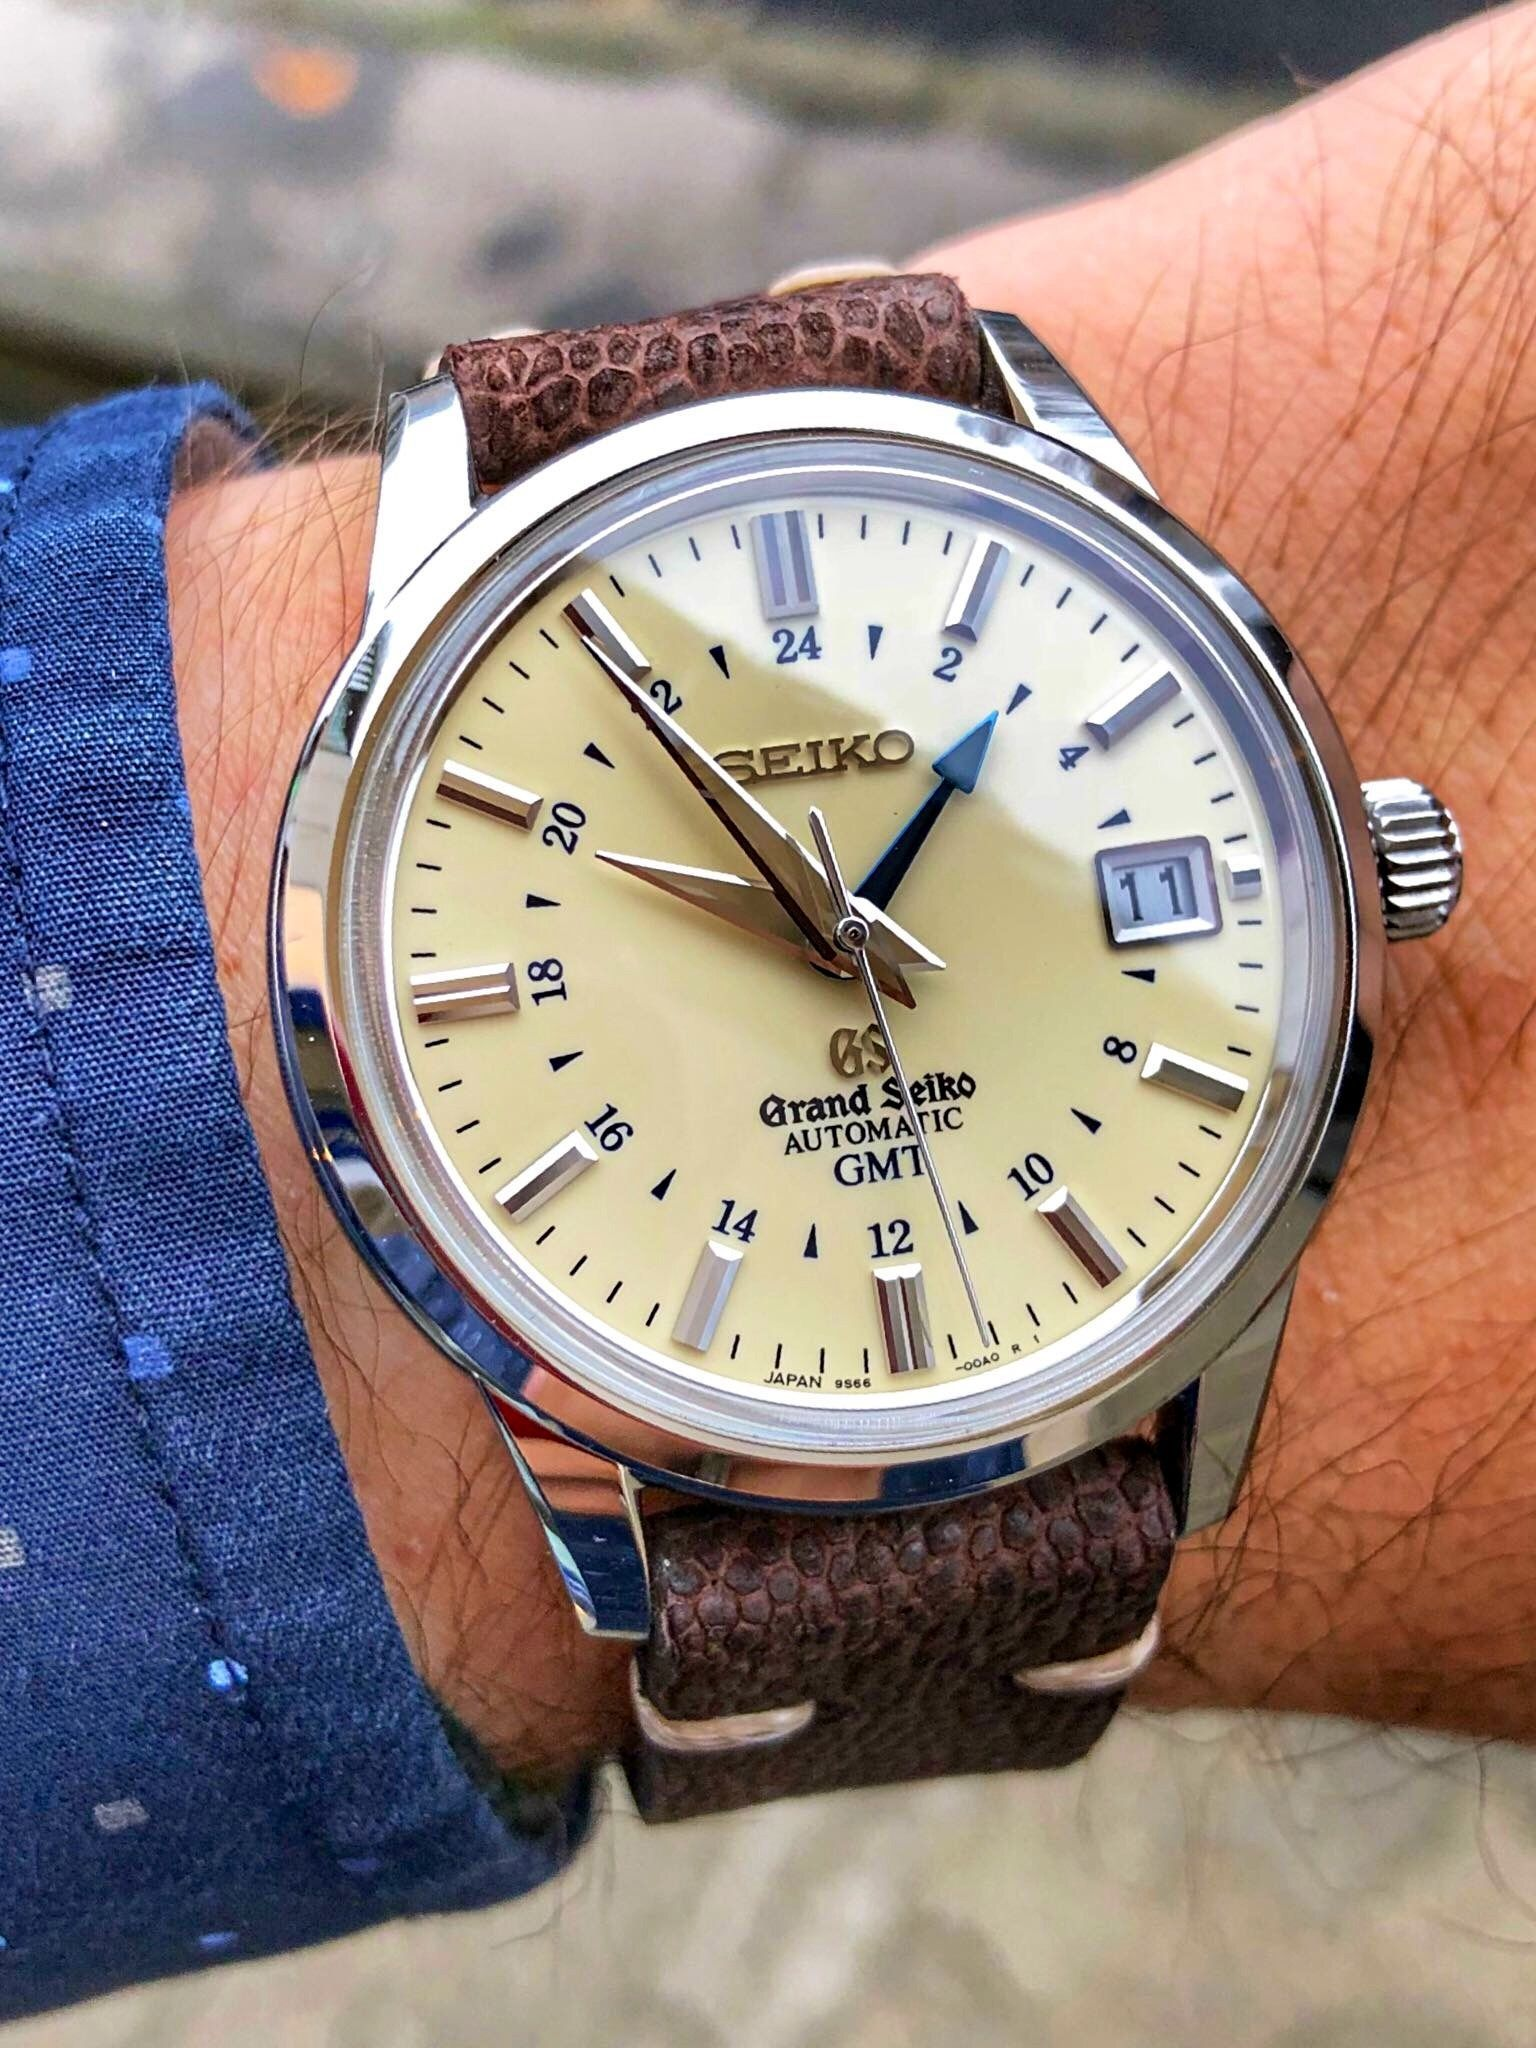 Đồng hồ seiko grand